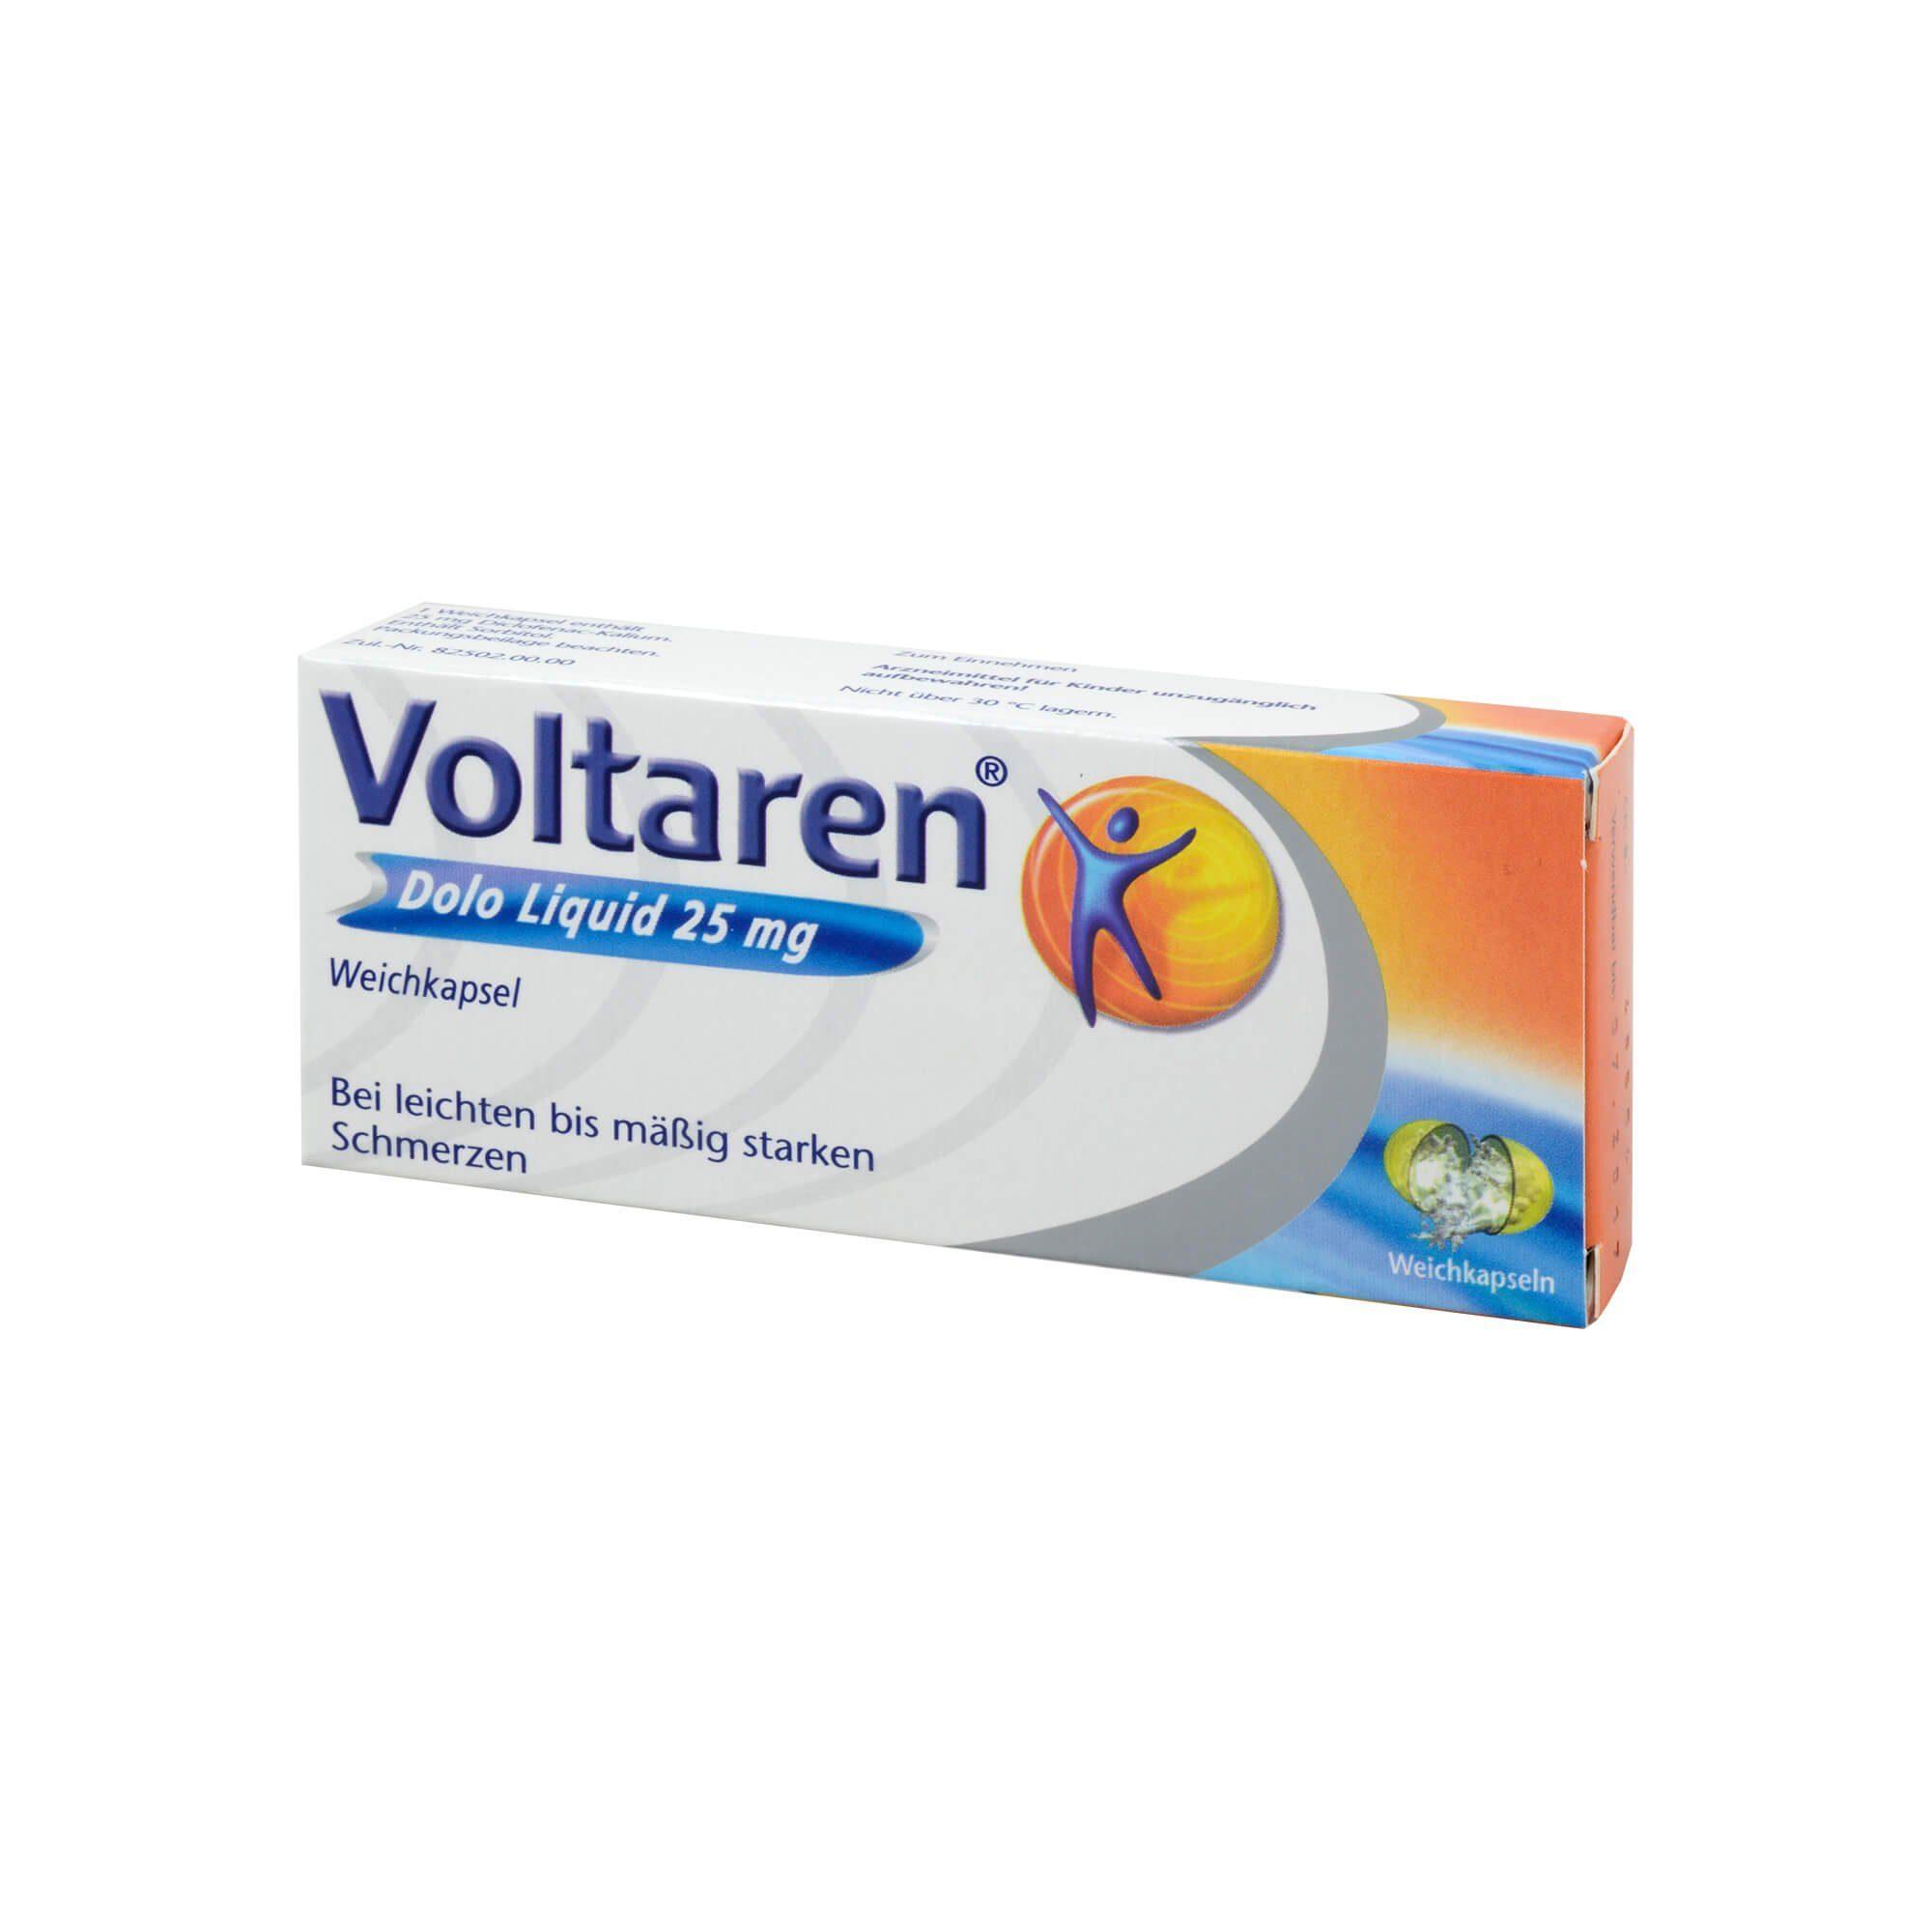 Voltaren Dolo Liquid 25 mg (, 20 St)